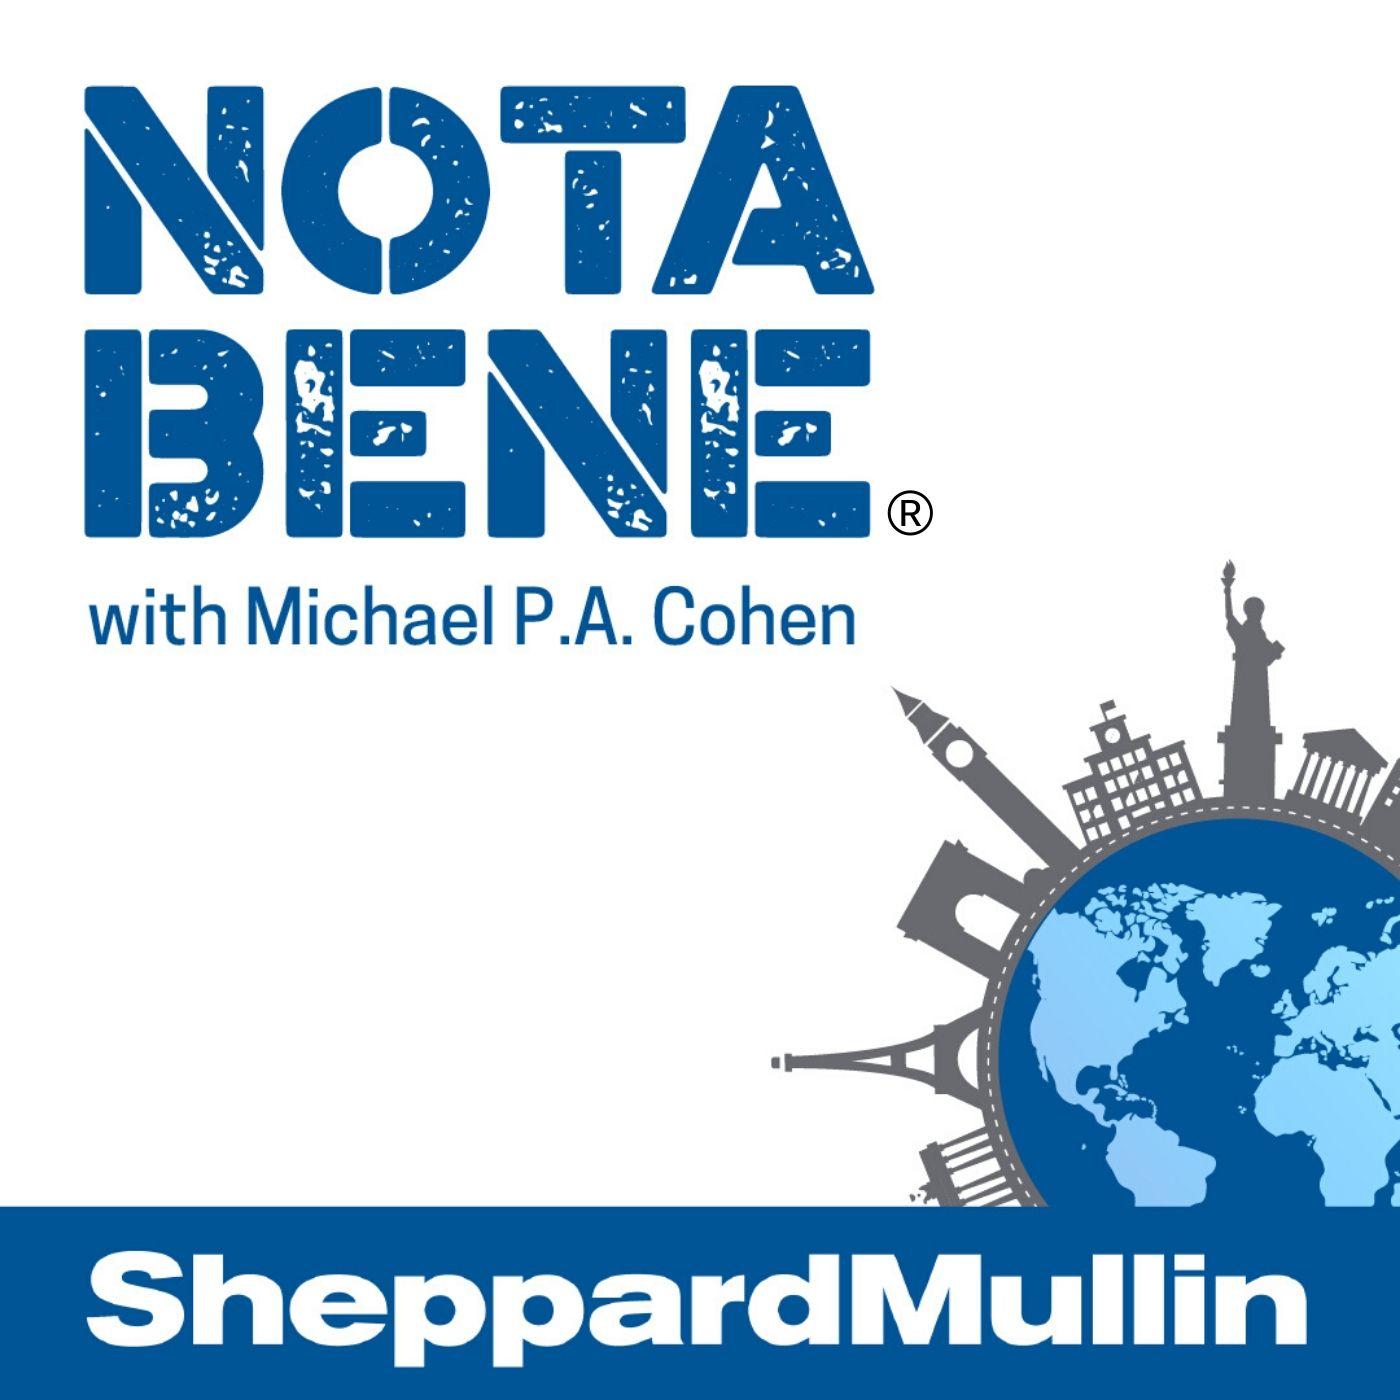 Sheppard Mullin's Nota Bene show art